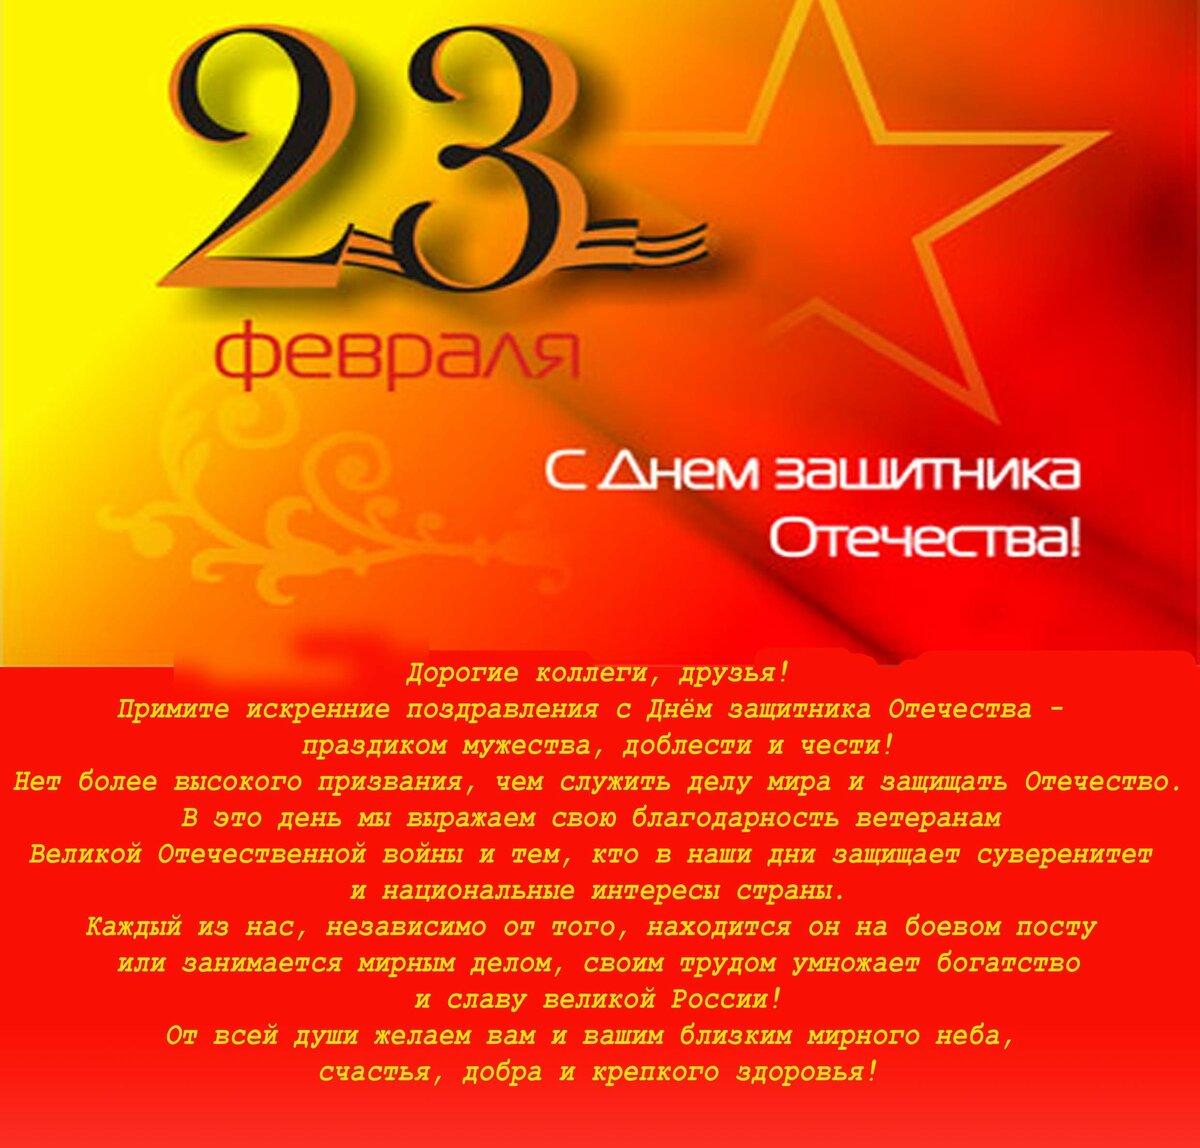 Вариант поздравления коллектива на 23 февраля, открытка лето